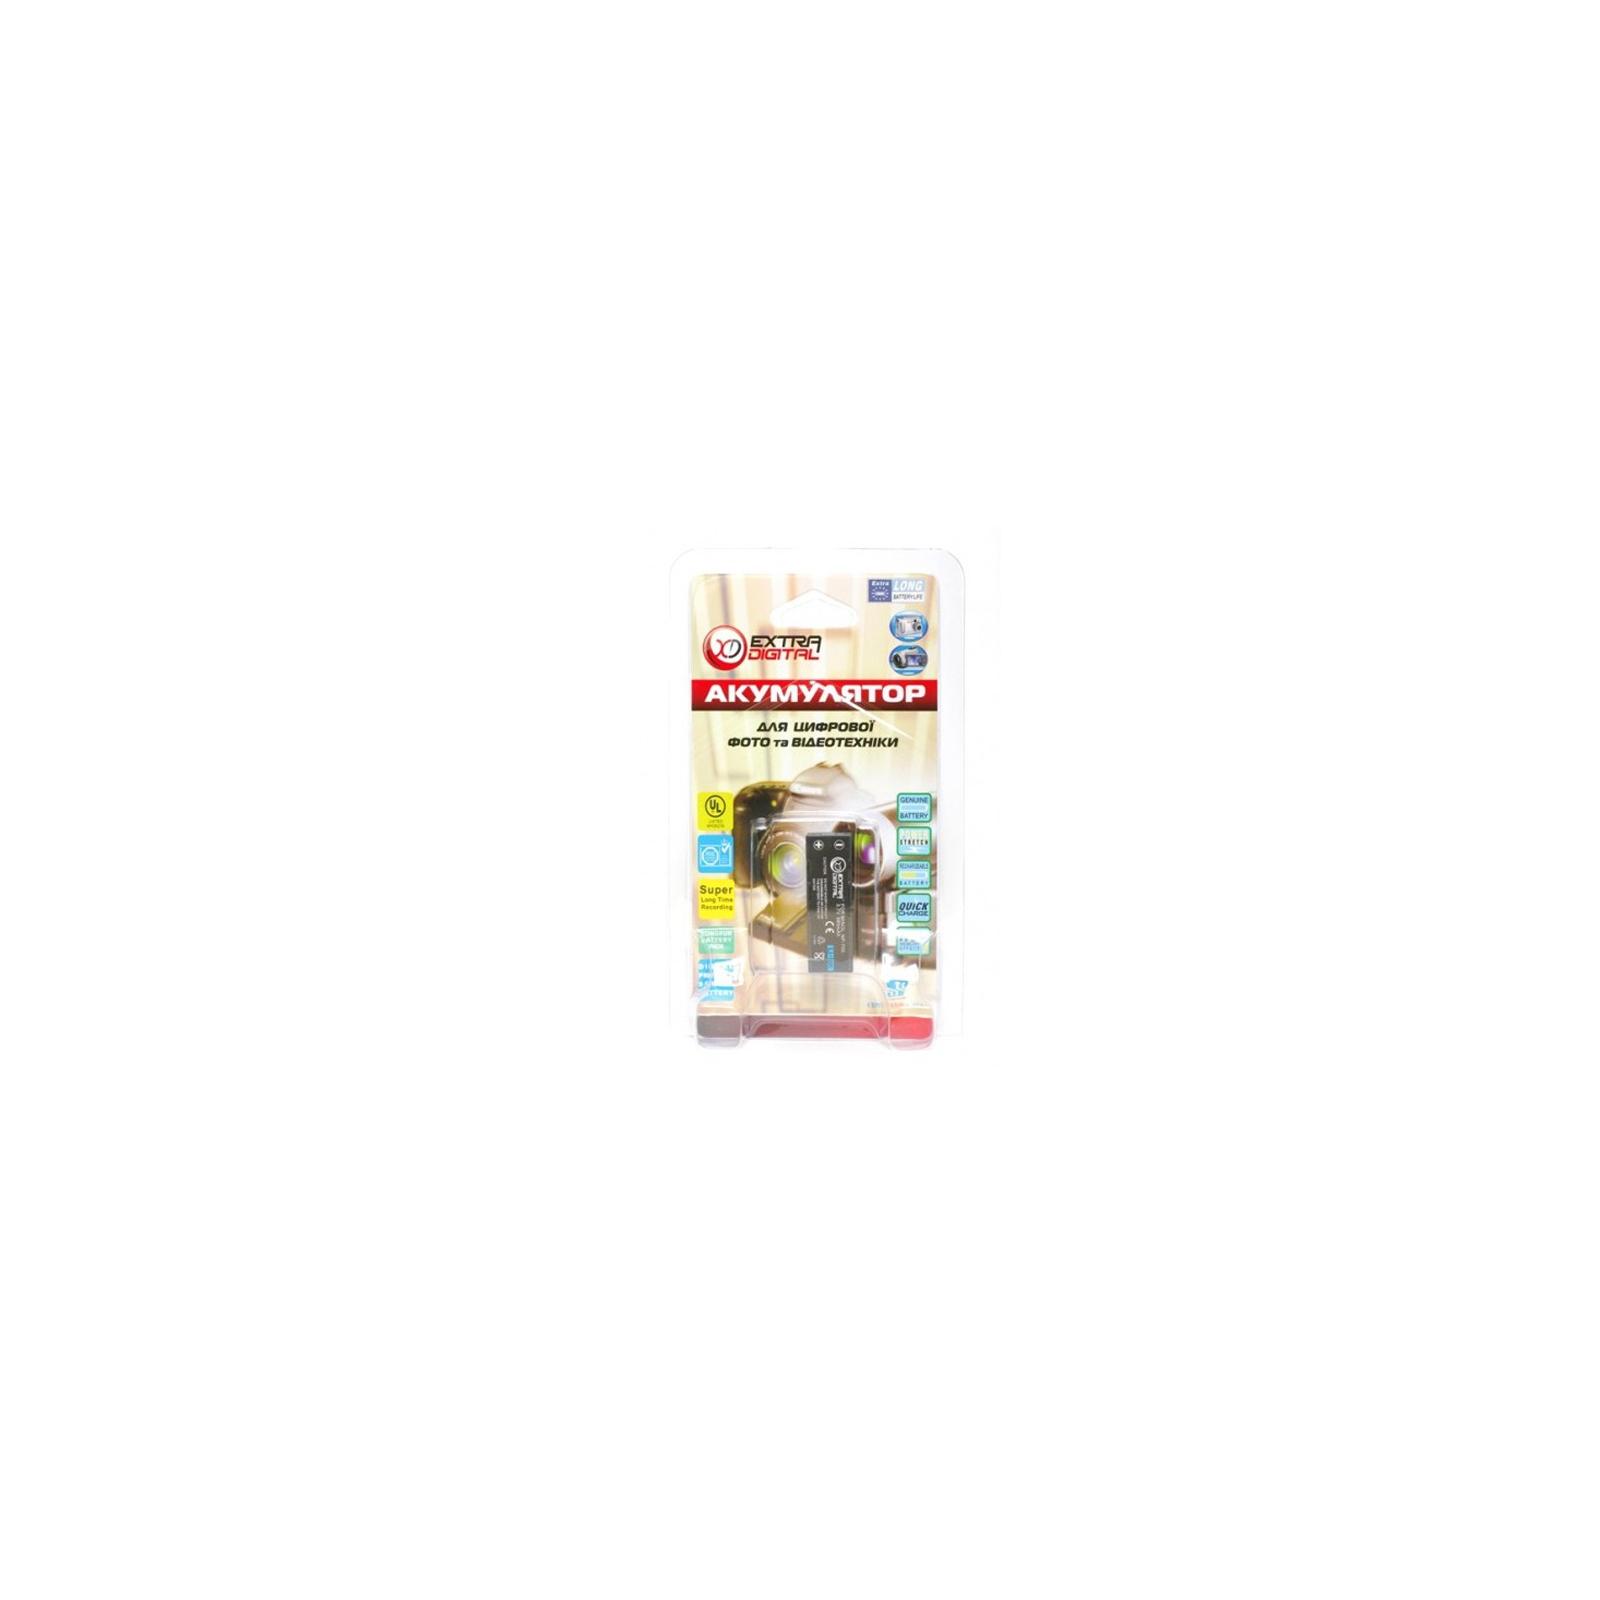 Аккумулятор к фото/видео EXTRADIGITAL Minolta NP-700, SLB-0637, DB-L30, D-LI72 (DV00DV1055) изображение 3